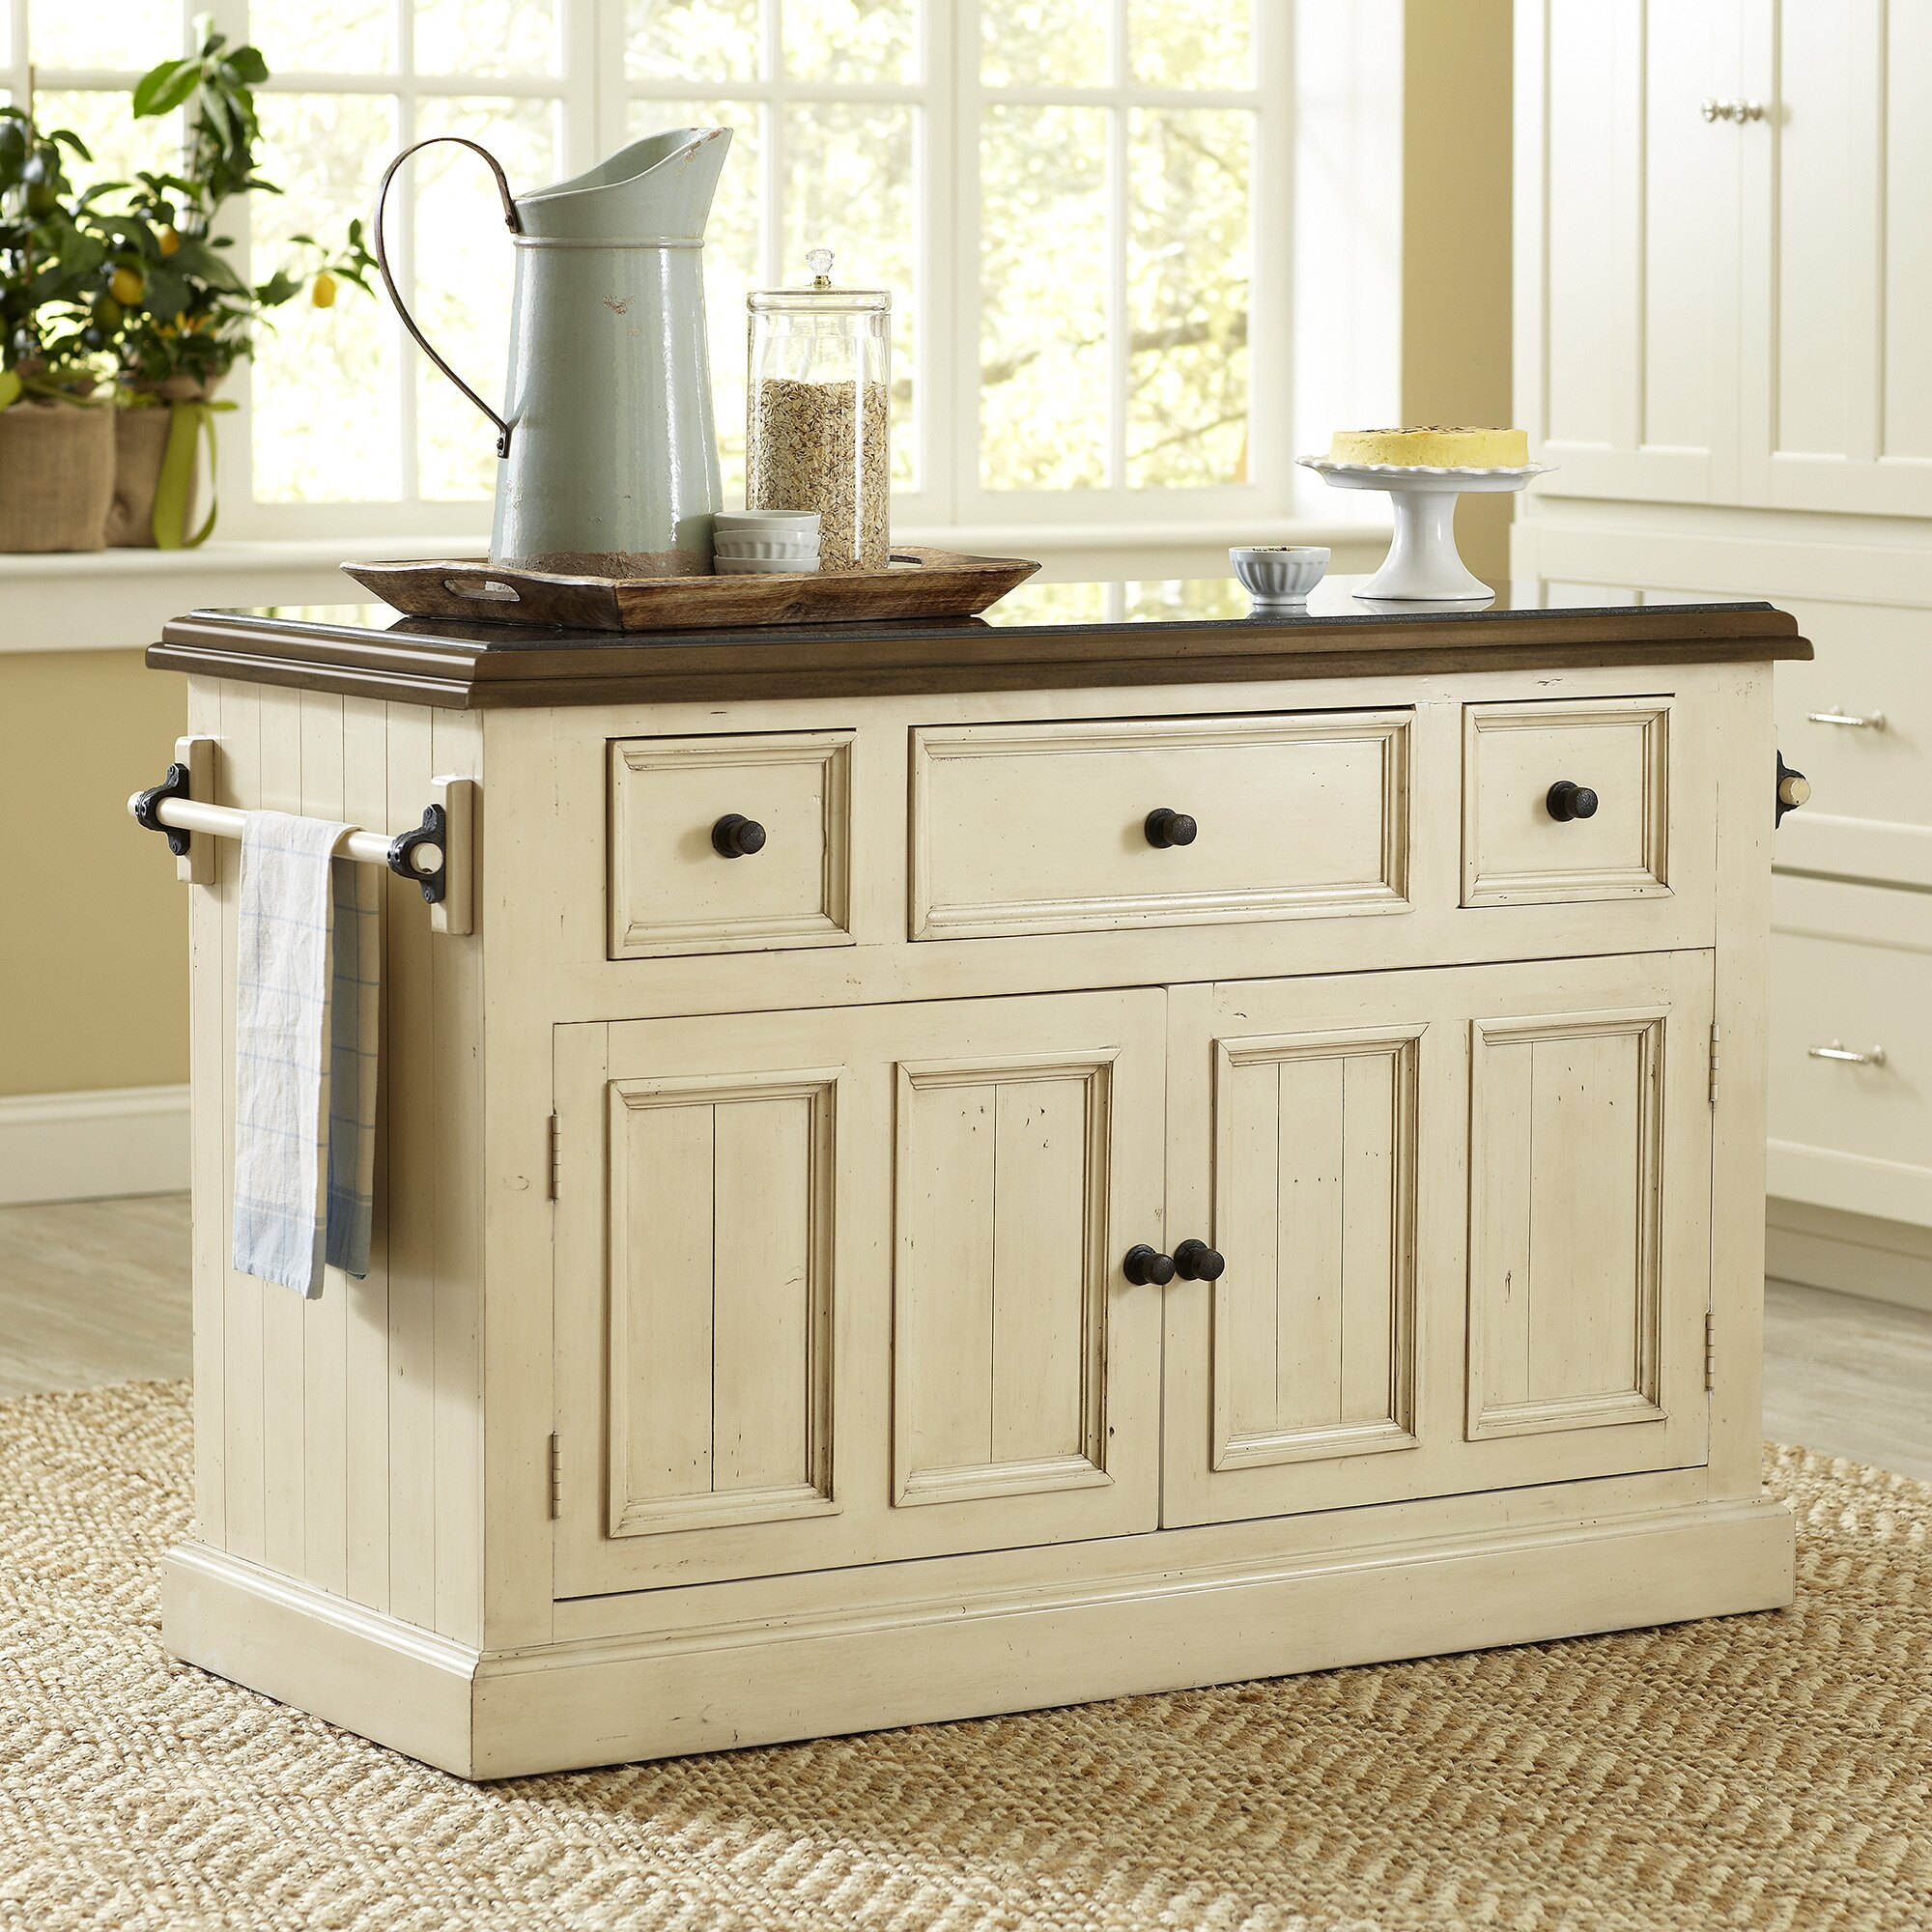 Uncategorized Kitchen Island Cart granite kitchen islands carts youll love wayfair harris island